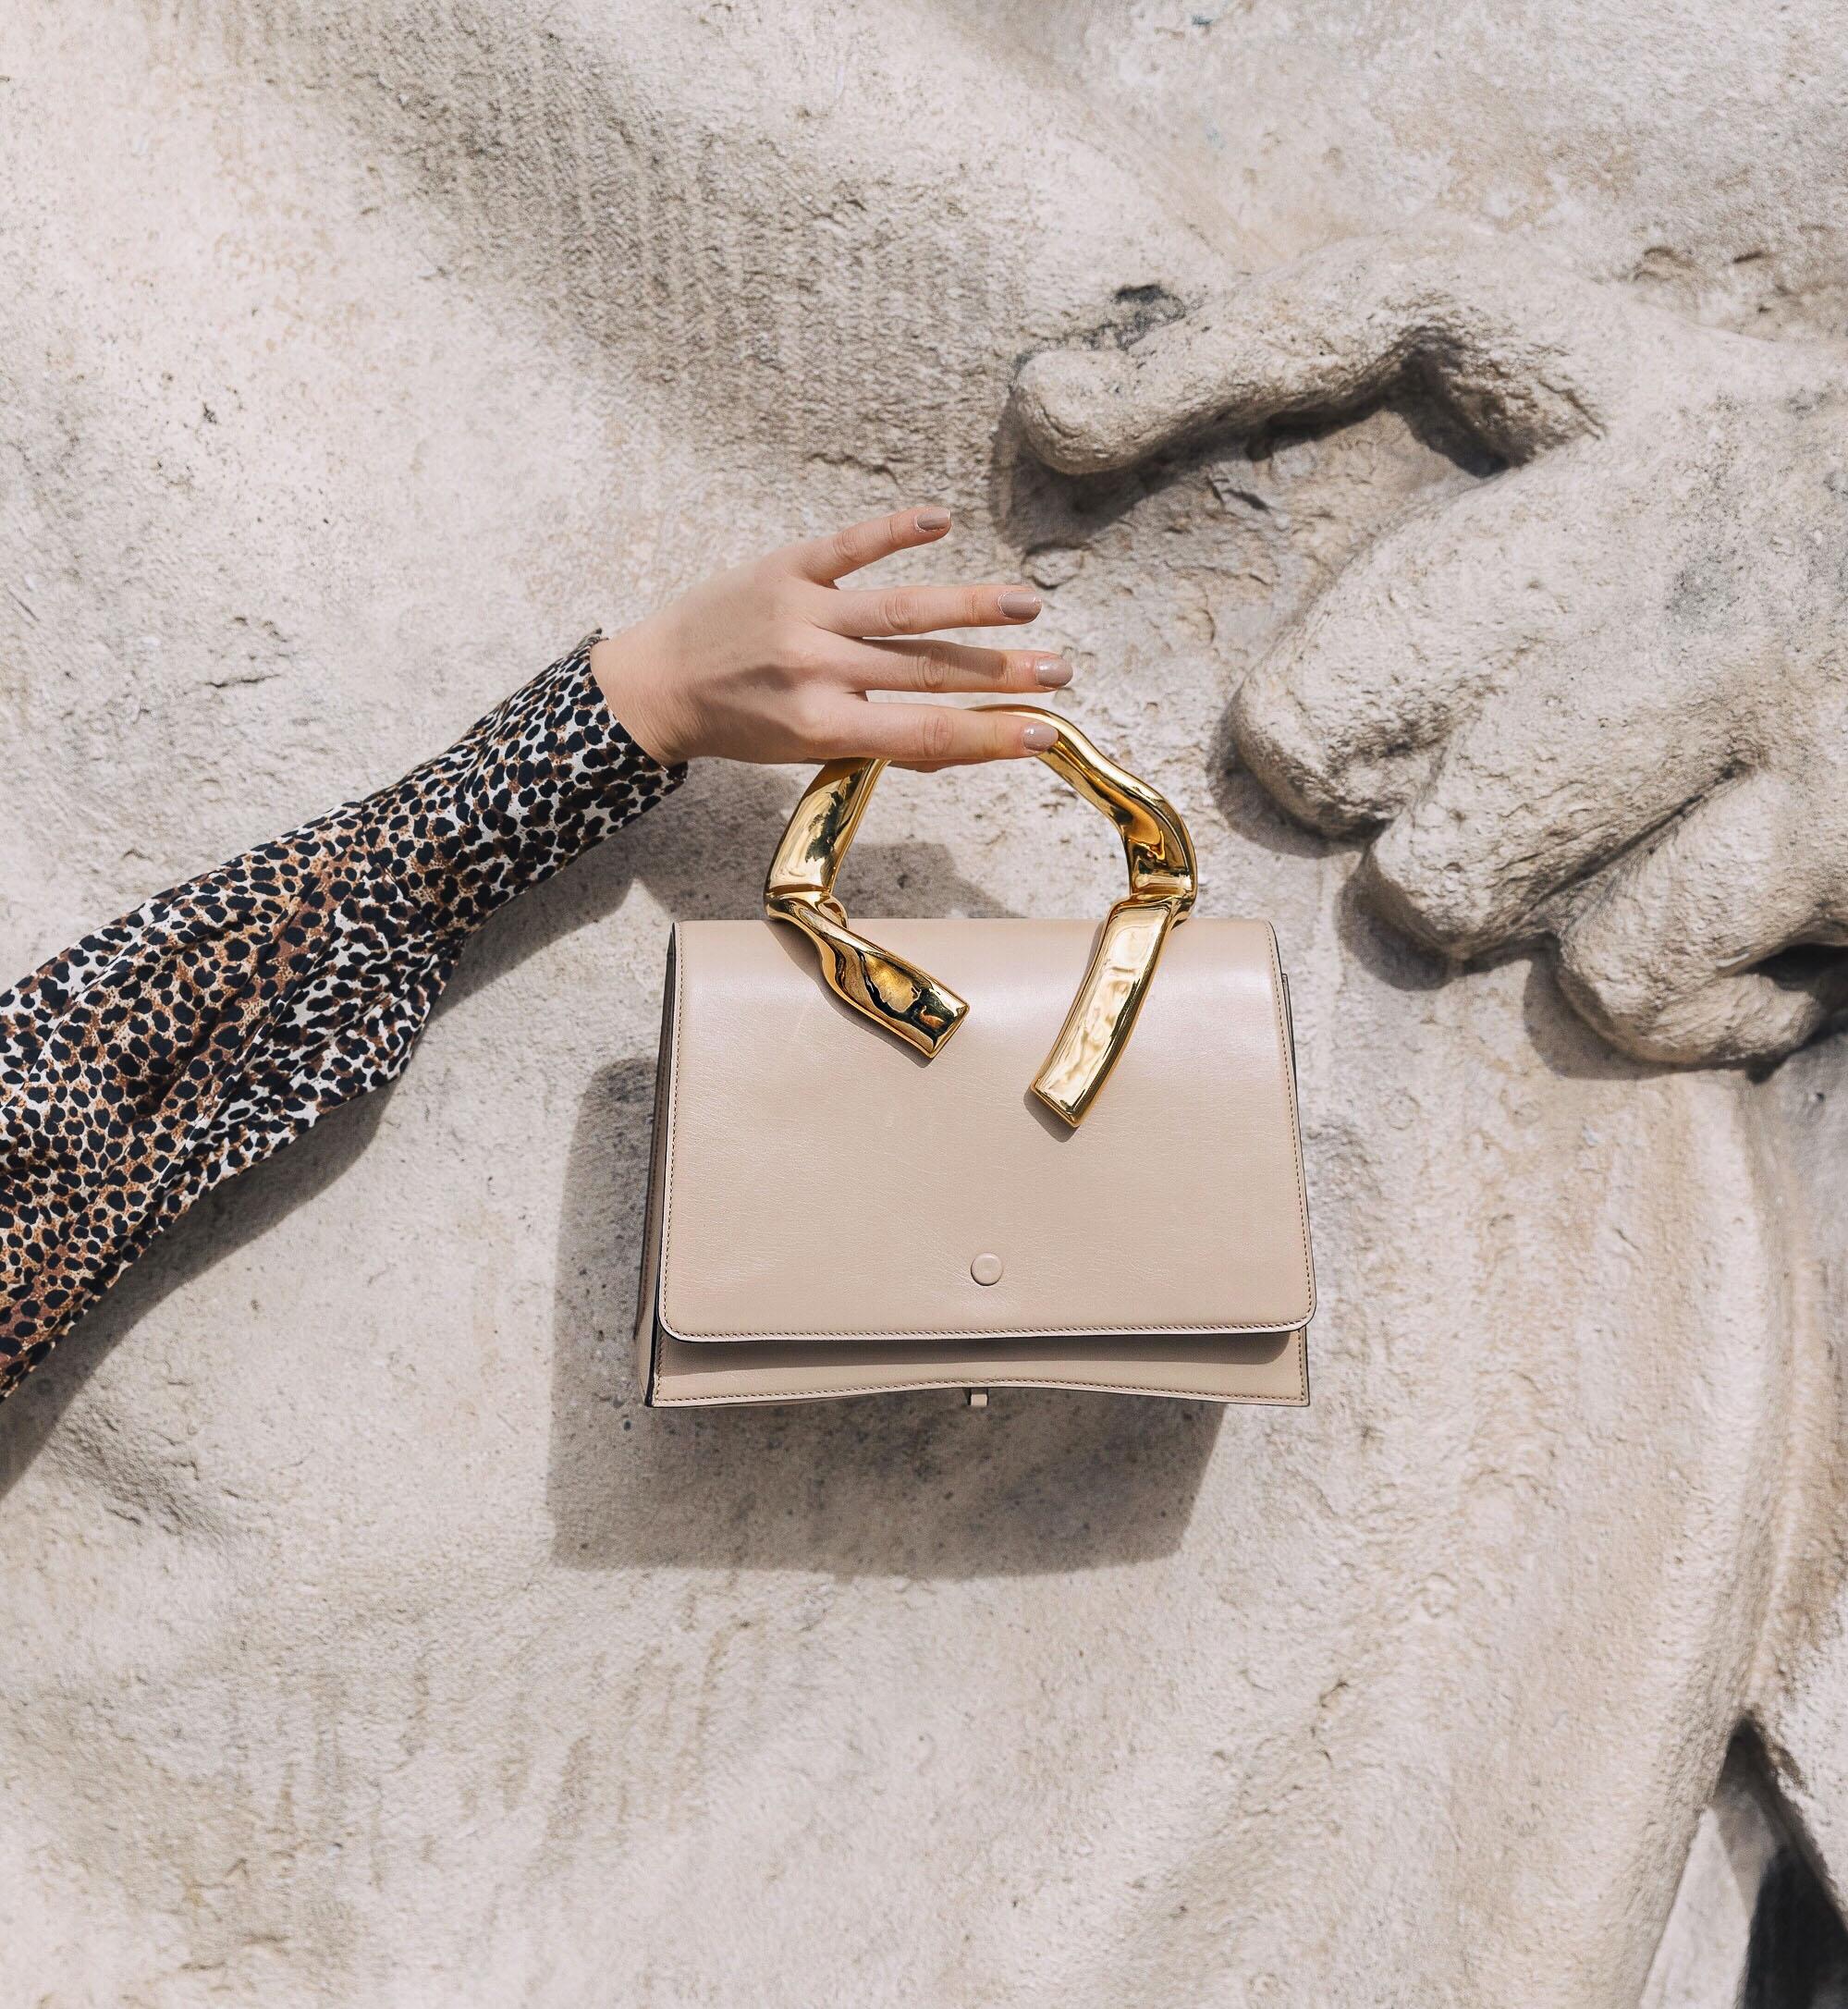 PFW SS20 Street Style Fall 2019 Paris Fashion Week Julia Comil wearing bag L Etrange Paris, blouse Equipment